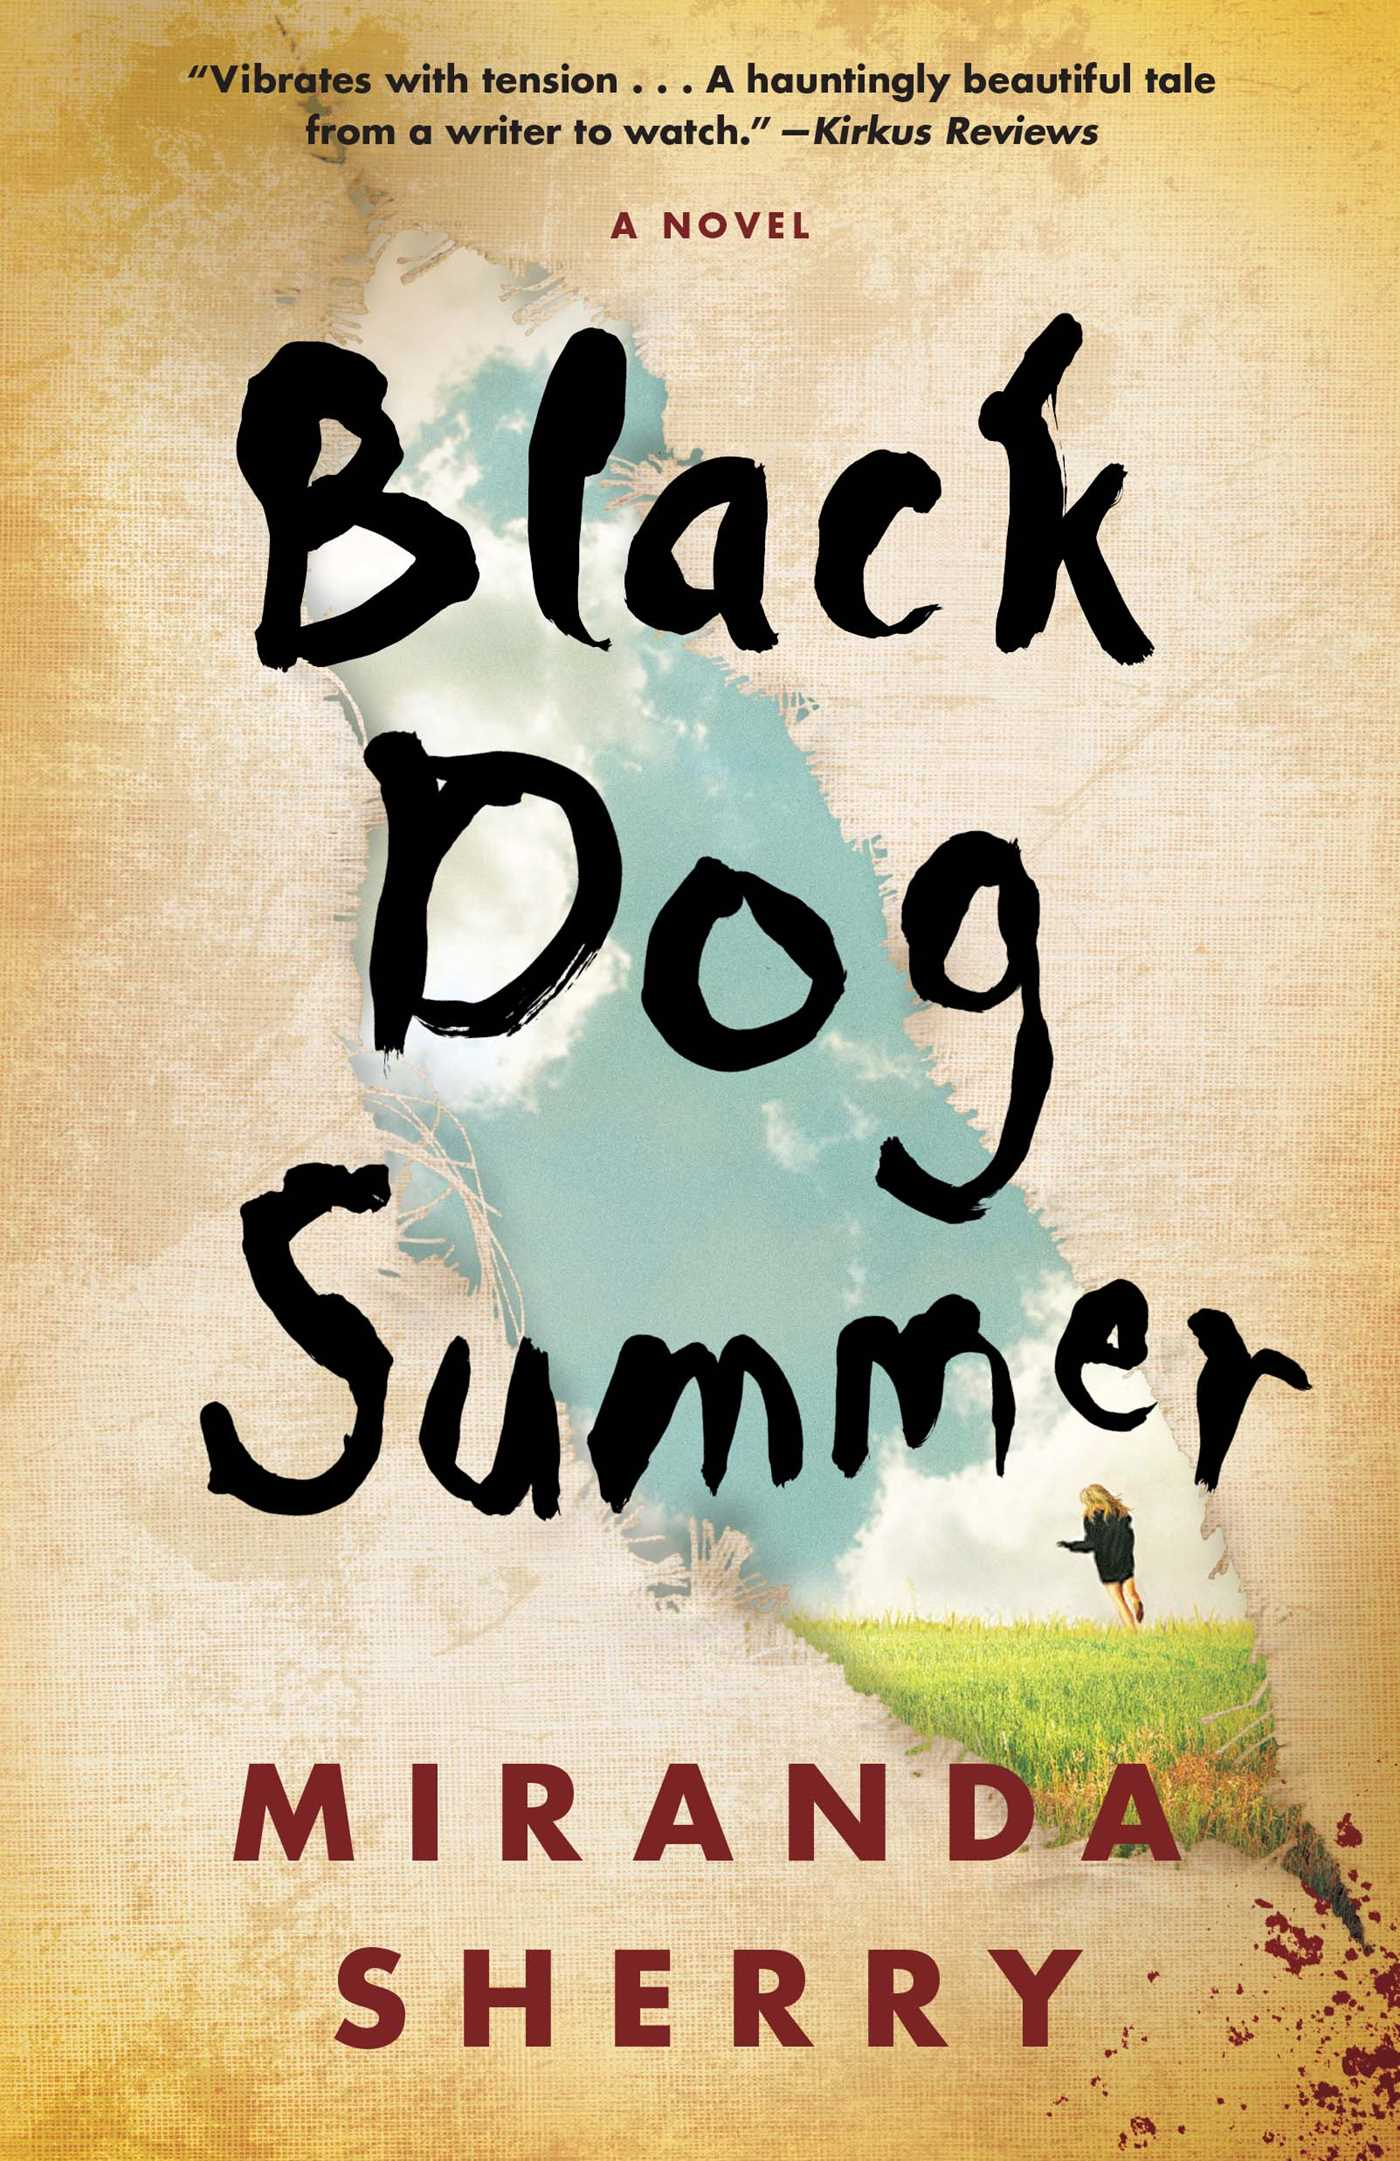 Black dog summer 9781476780047 hr